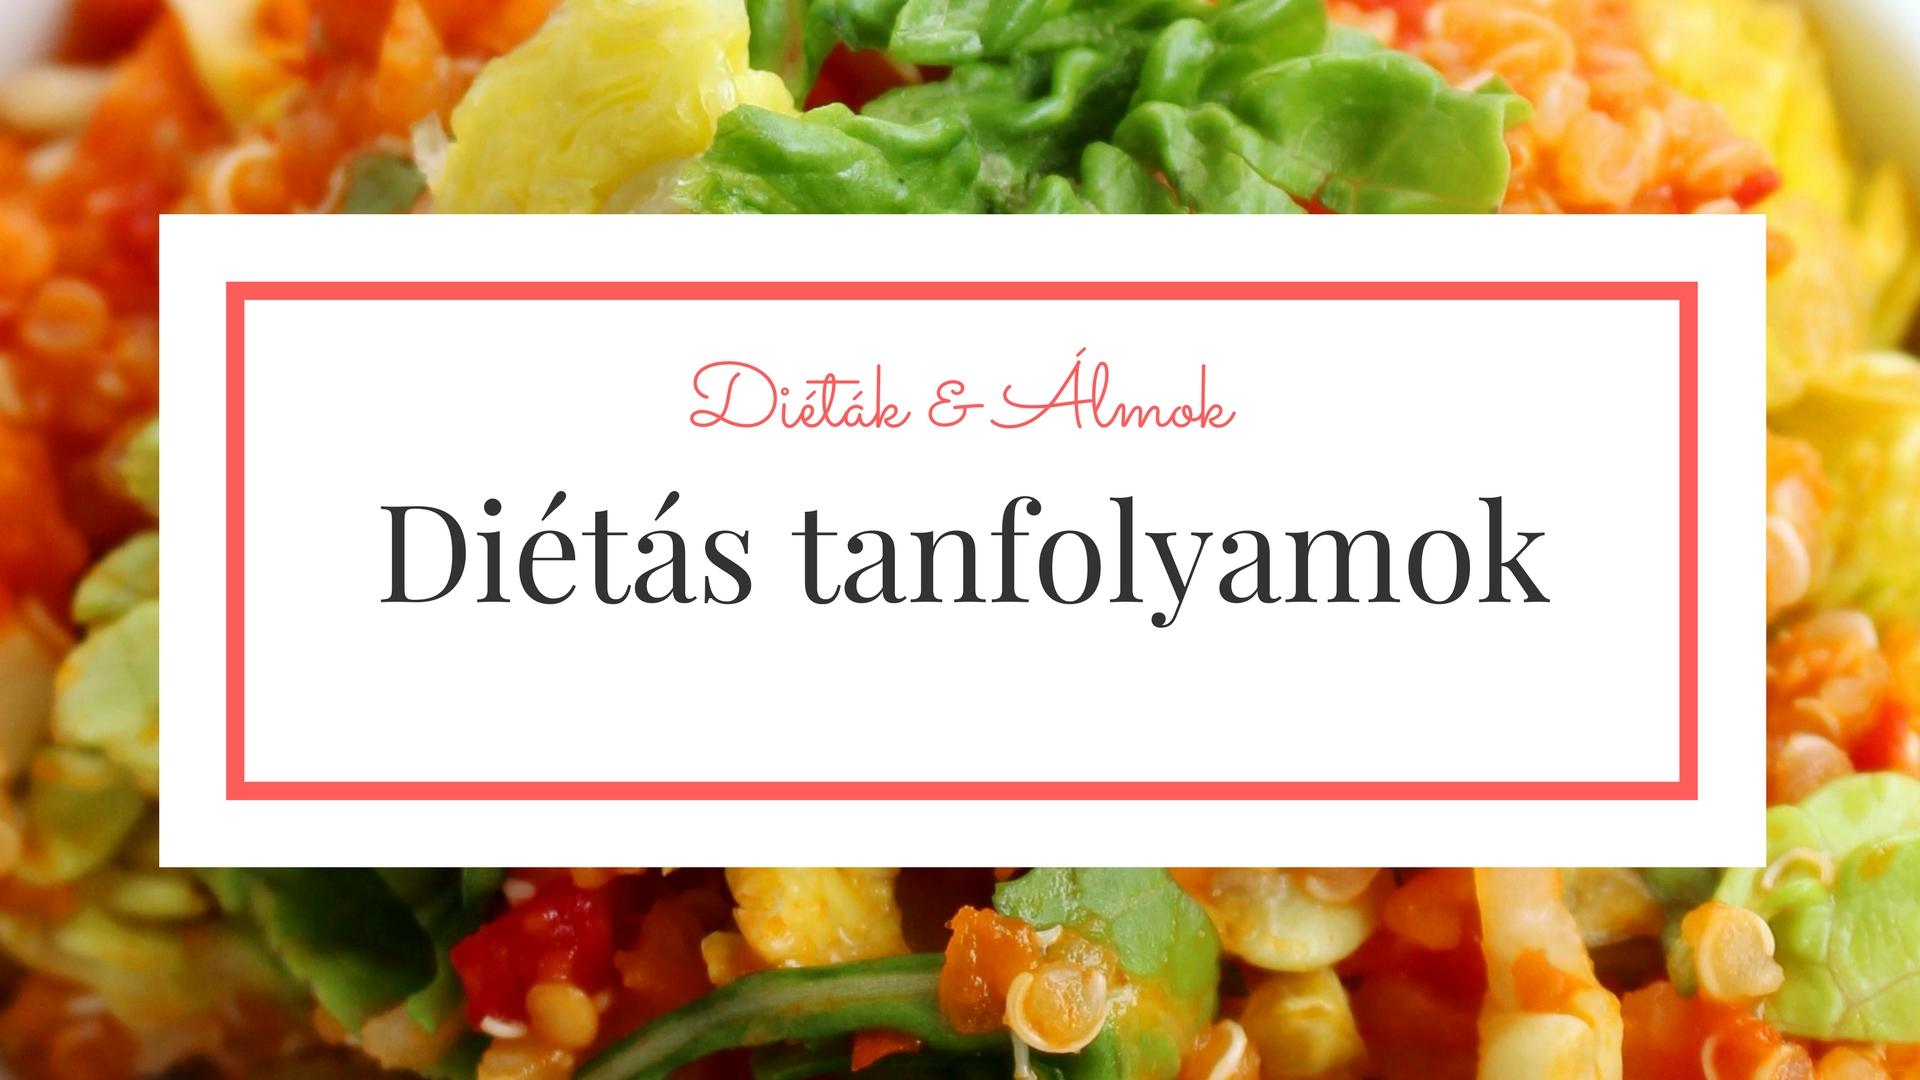 dietak_almok_szenhidrat_dieta_tanfolyamok_blog_1.jpg